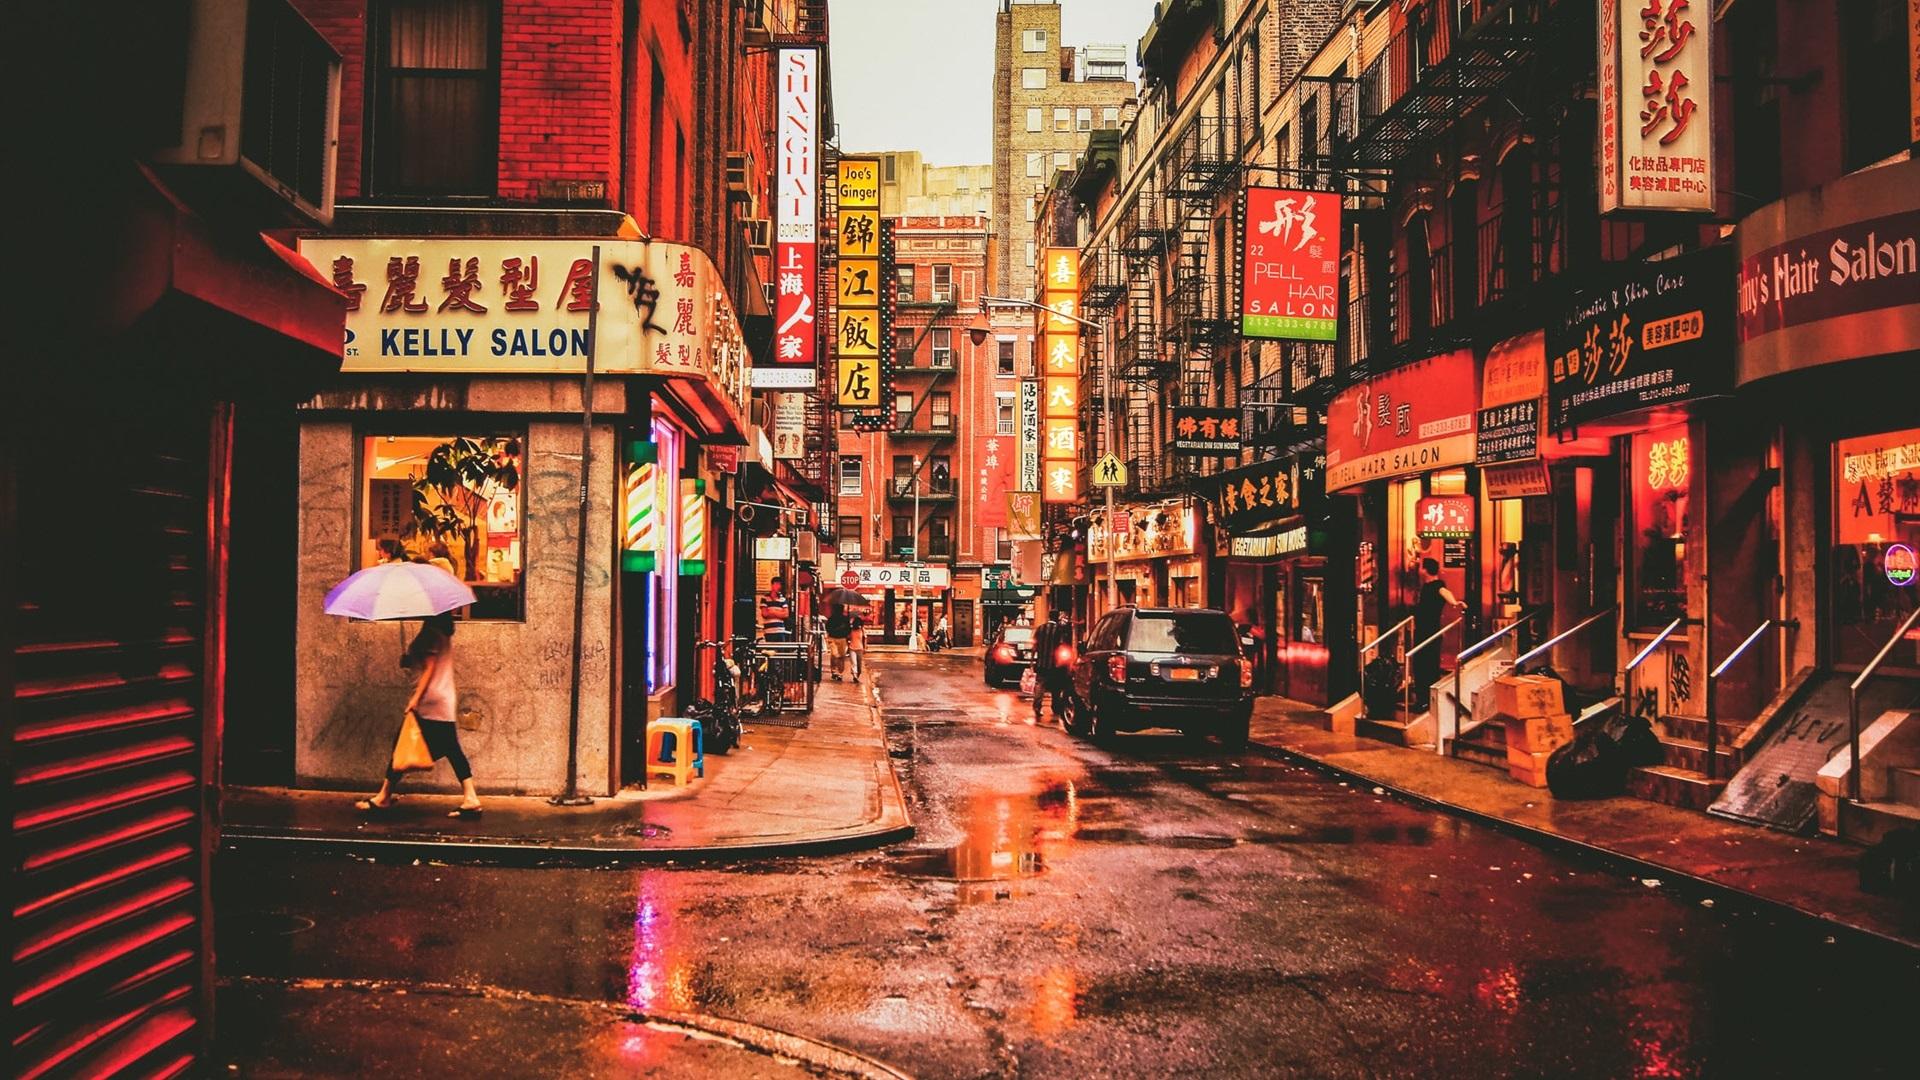 Wallpaper New York Chinatown USA Street Restaurants Cars